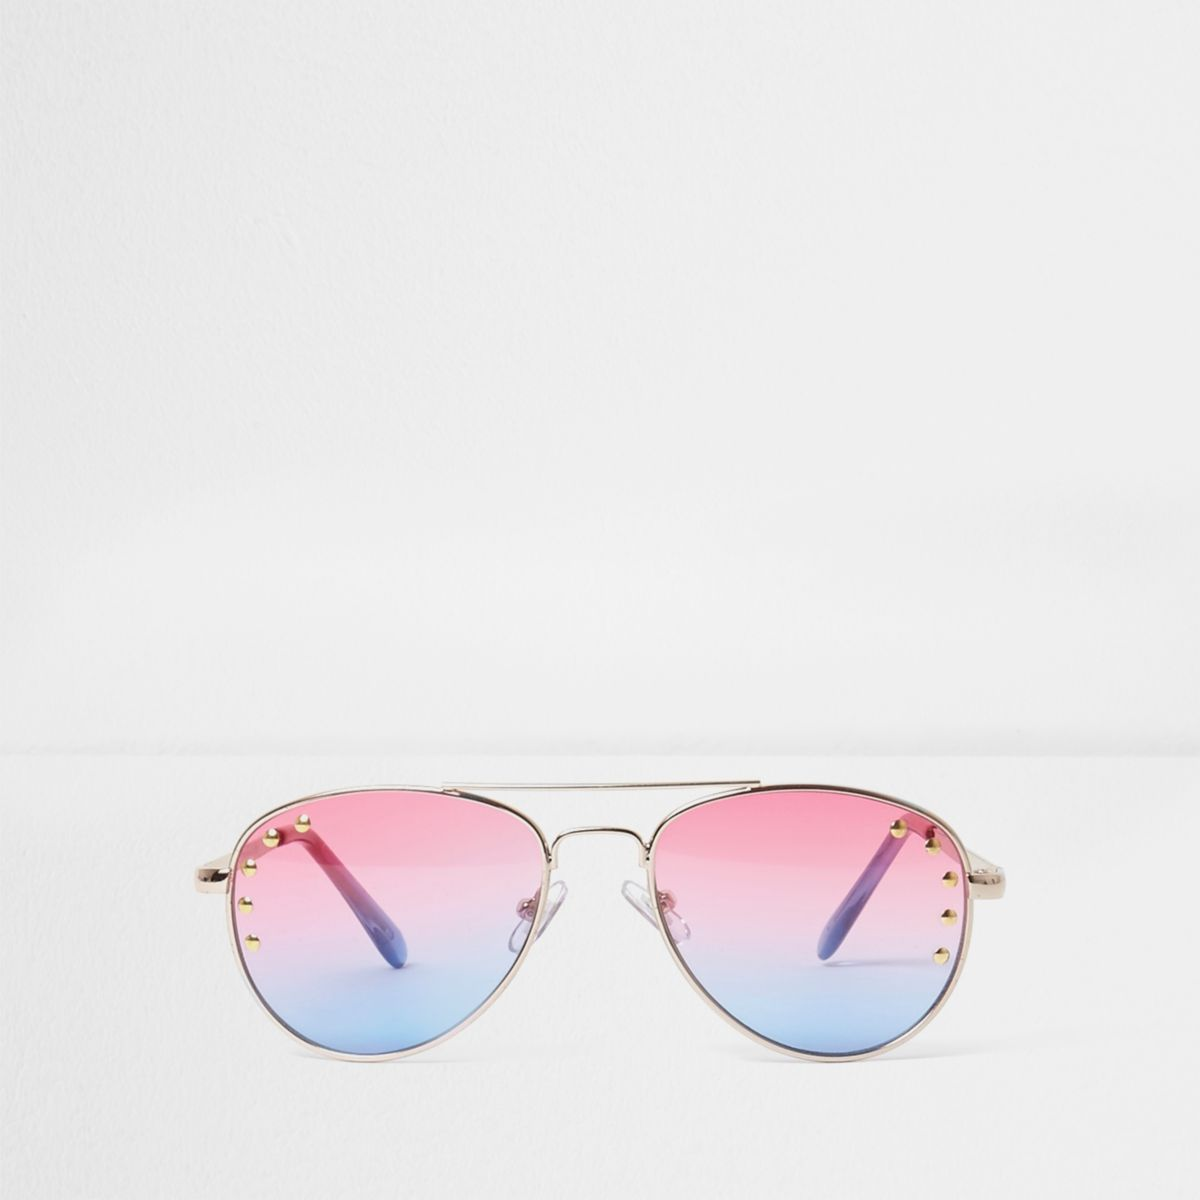 Girls pink blue stud aviator sunglasses